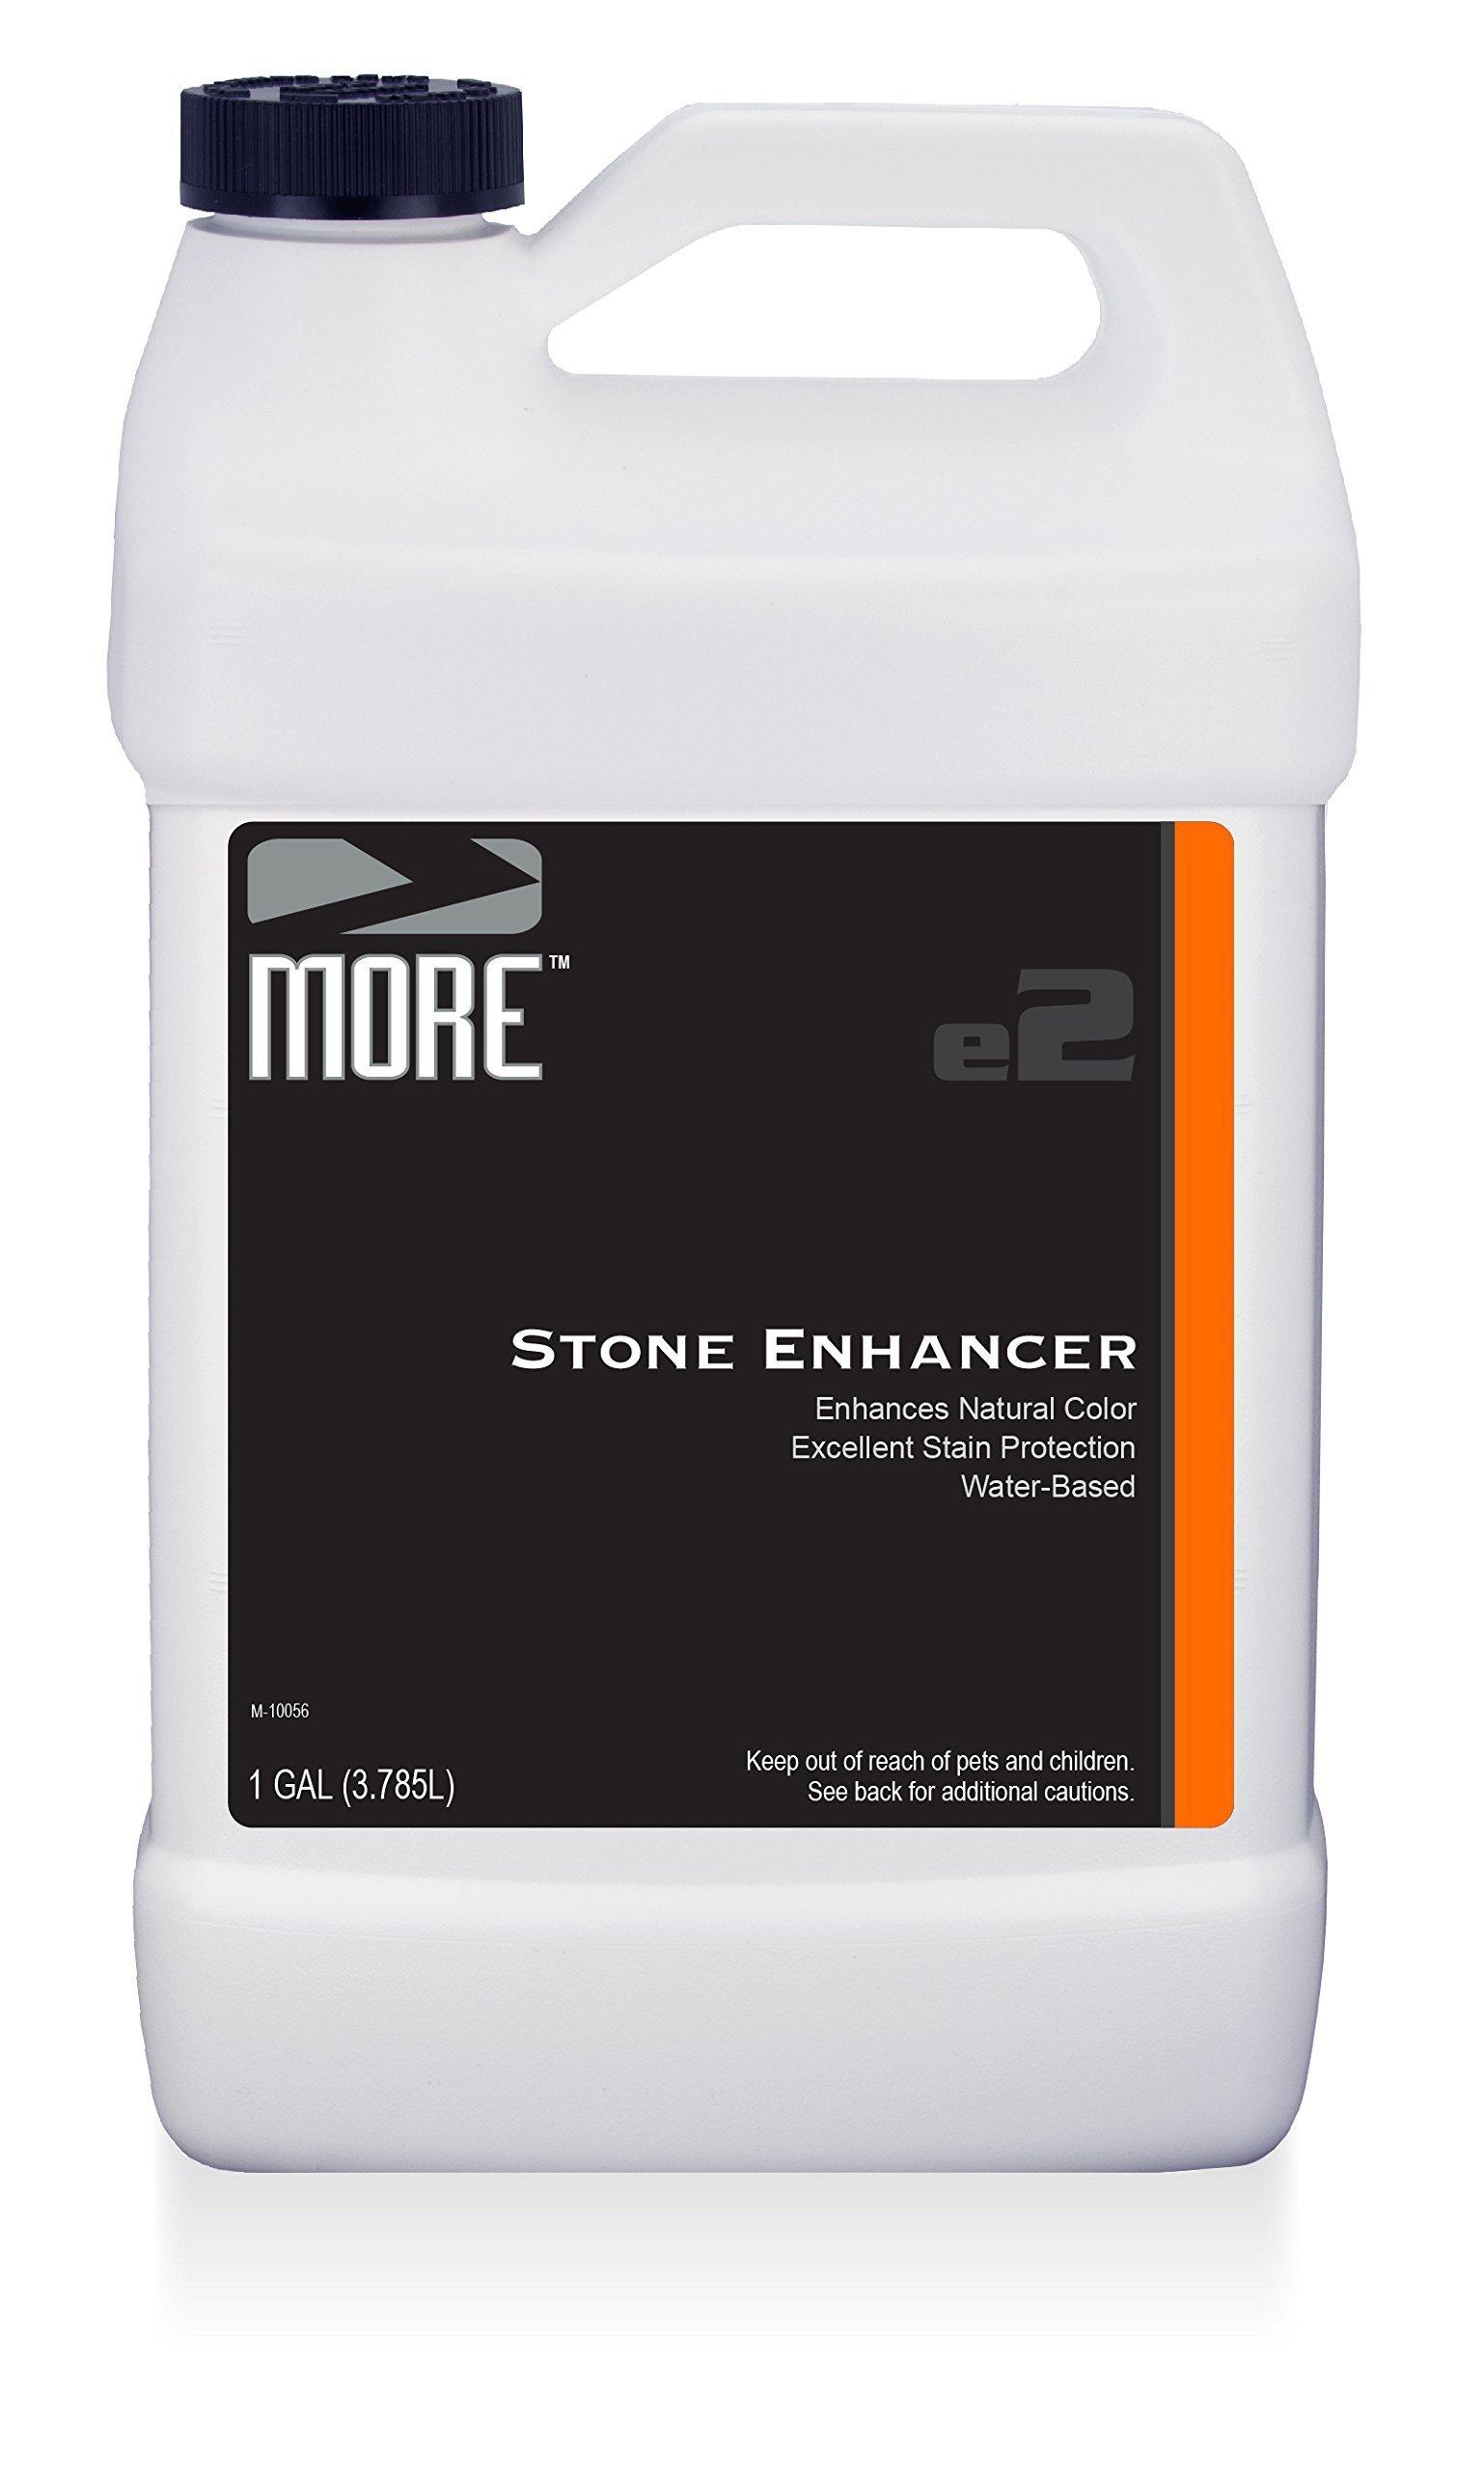 MORE Stone Enhancer - Marble, Granite and Natural Stone Sealer and Enhancer - Water Based Formula [Gallon / 128 Oz.]